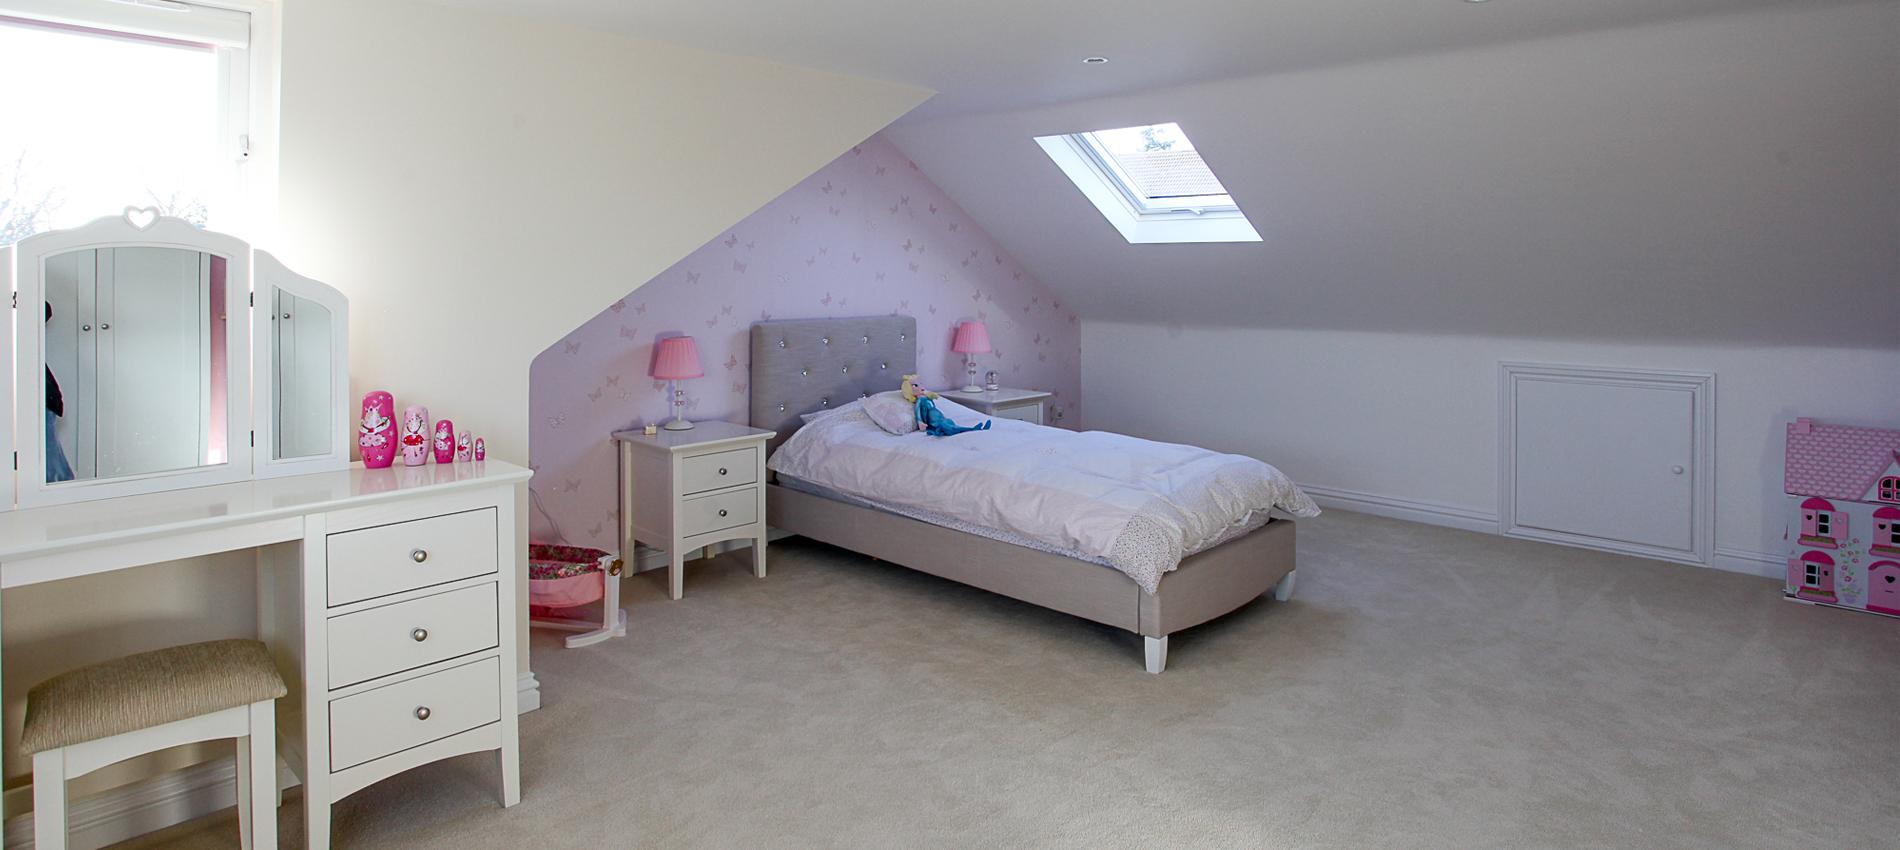 Darren lindsey lucas skylofts for Skylofts 1 bedroom loft suite